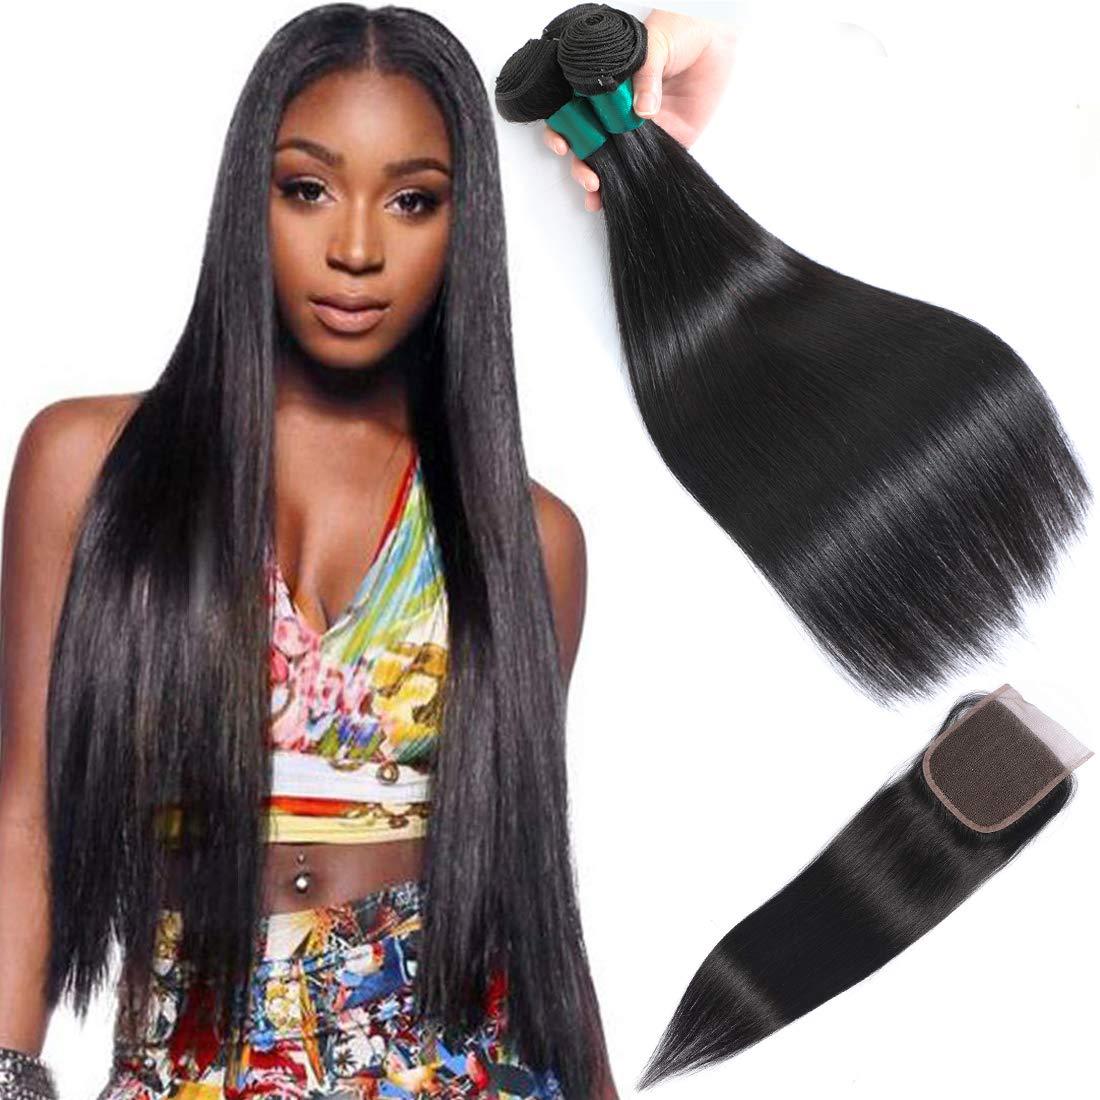 AUTTO Hair Unprocessed Peruvian Luxury Import Straight 3 Human wi Bundles